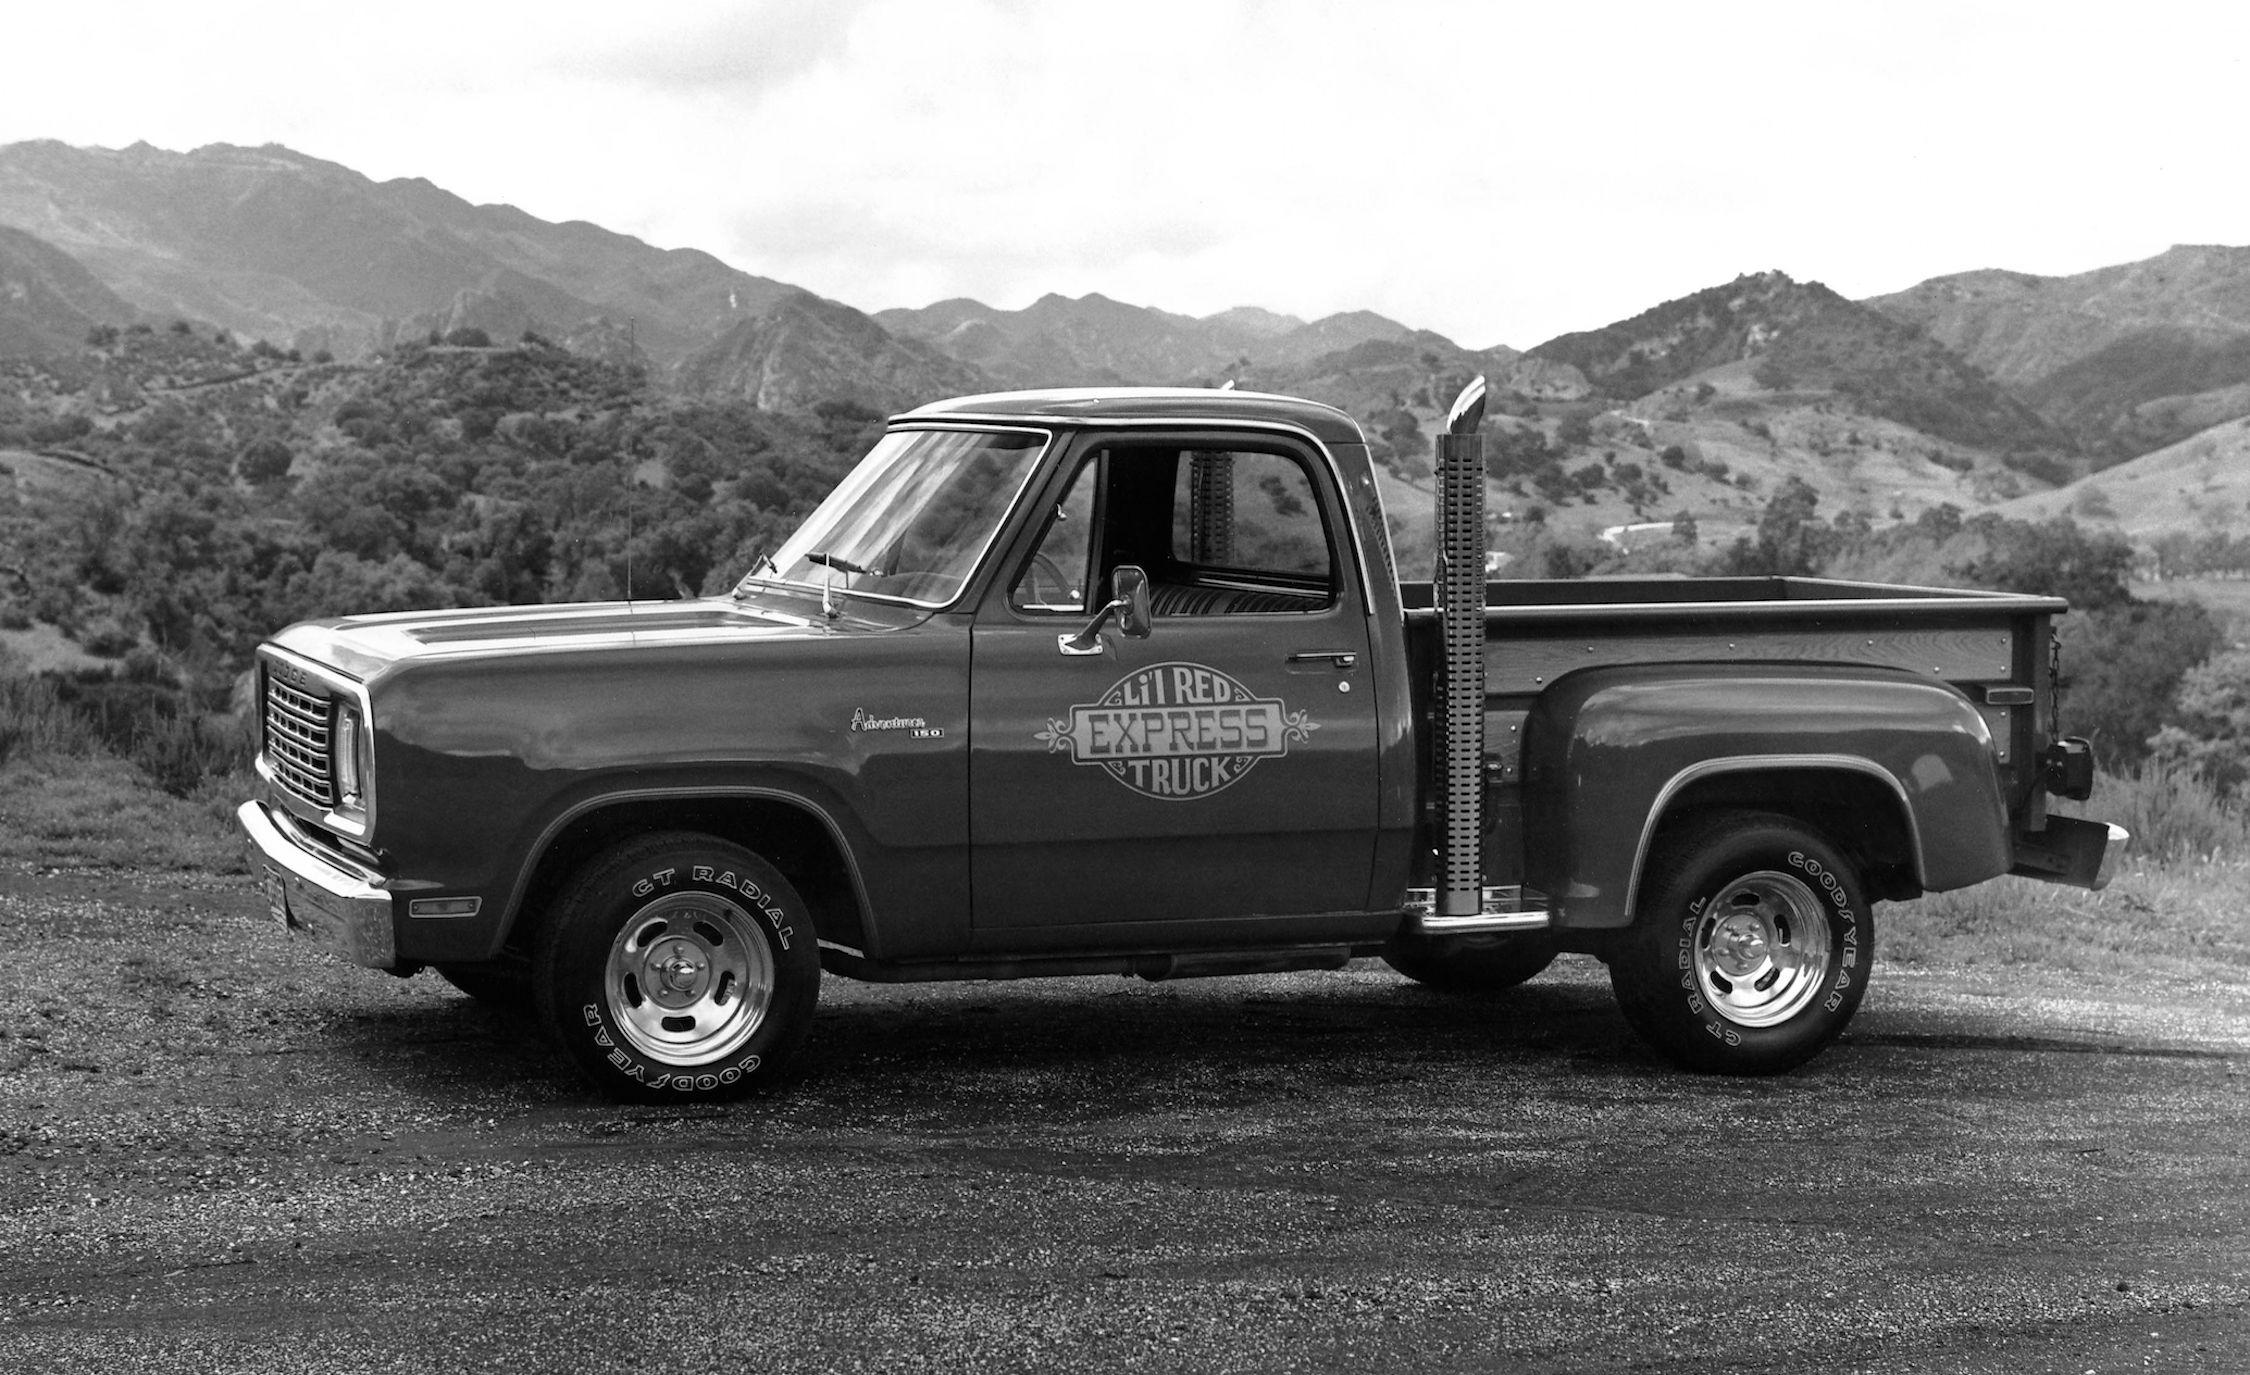 Mondo Macho Special Edition Trucks Of The 70s K Billys Super 1980 Dodge Truck Wheels Badge And Stripe Jobs